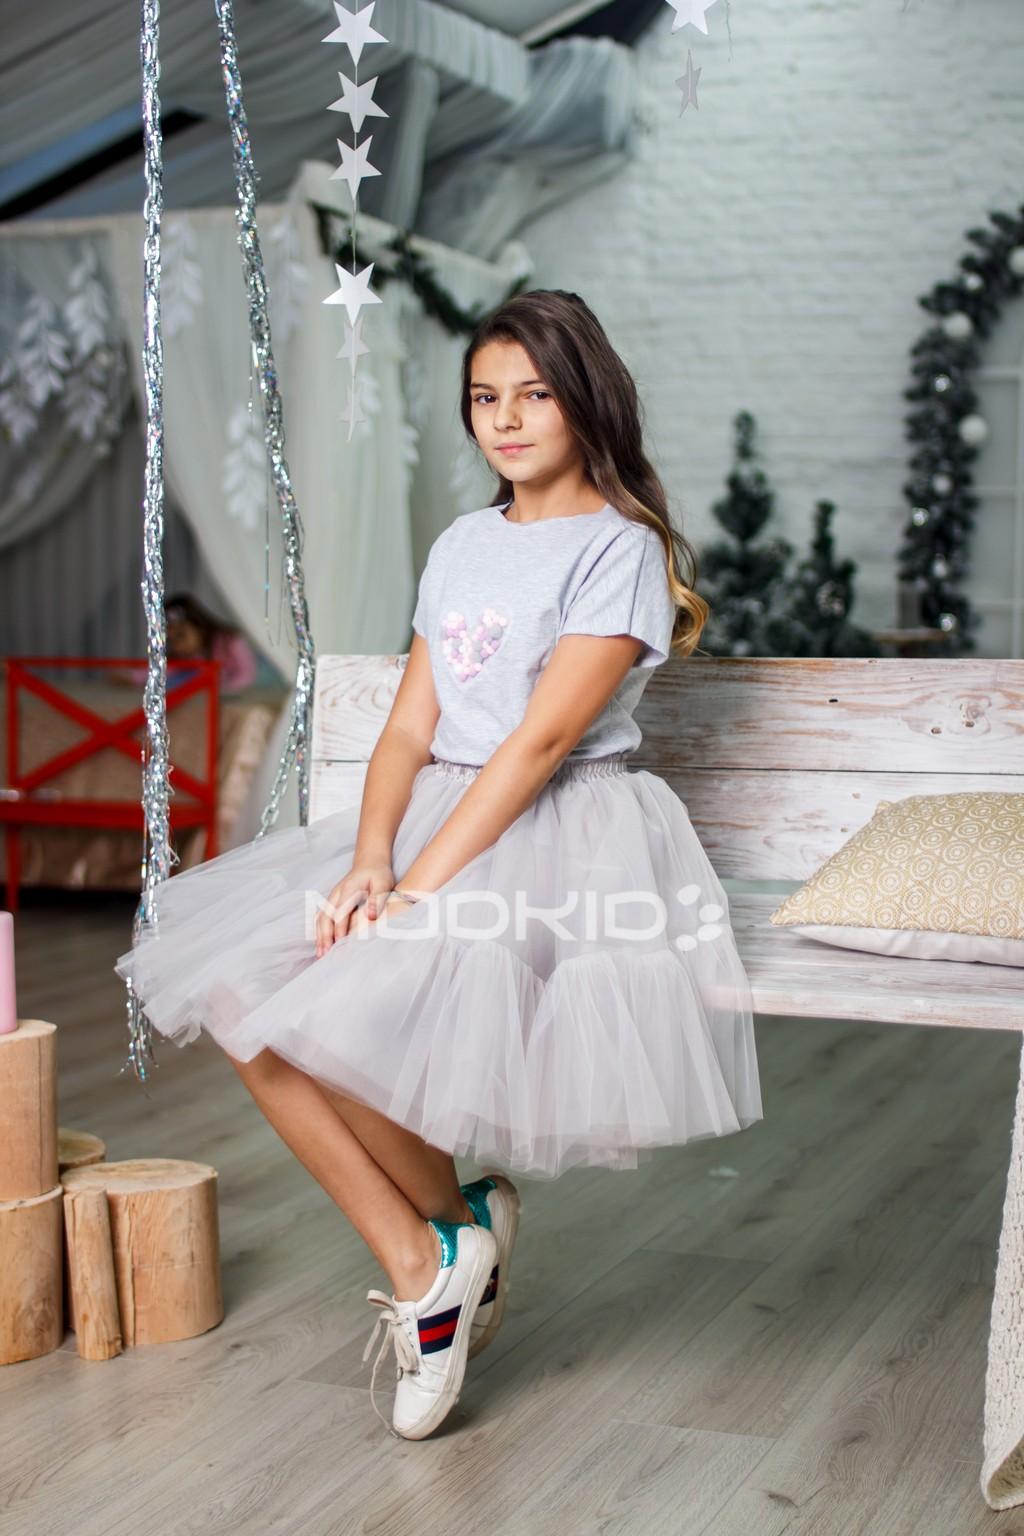 https://modkid.com.ua/images/stories/virtuemart/product/IMG_0677.jpg